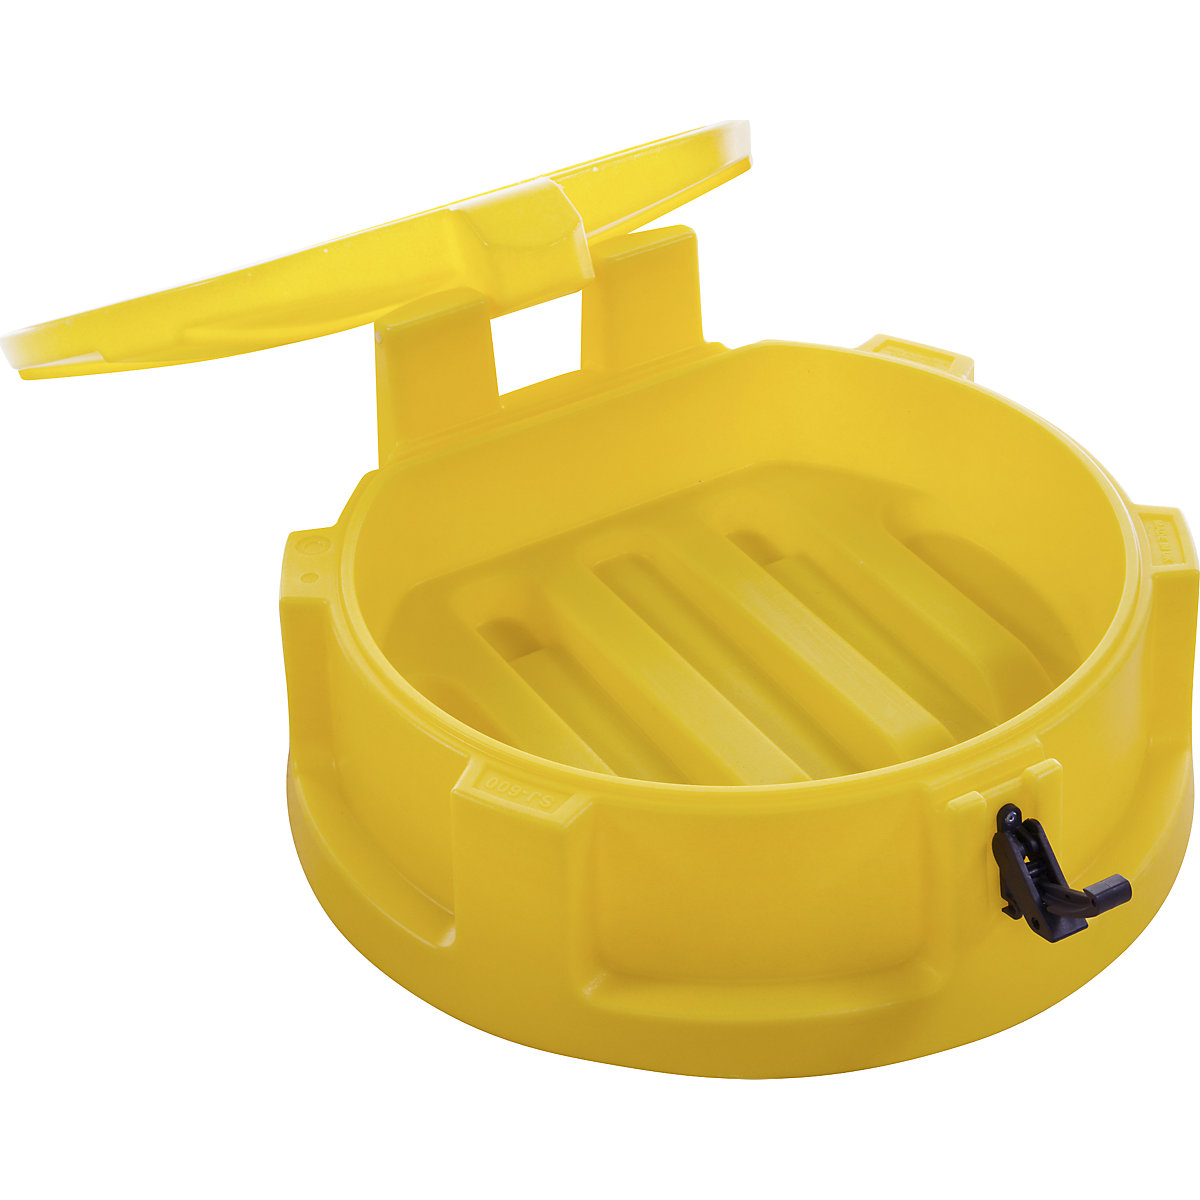 Plastic drum funnel: Ø 620 mm, lid, catch, sieve   KAISER+KRAFT  International